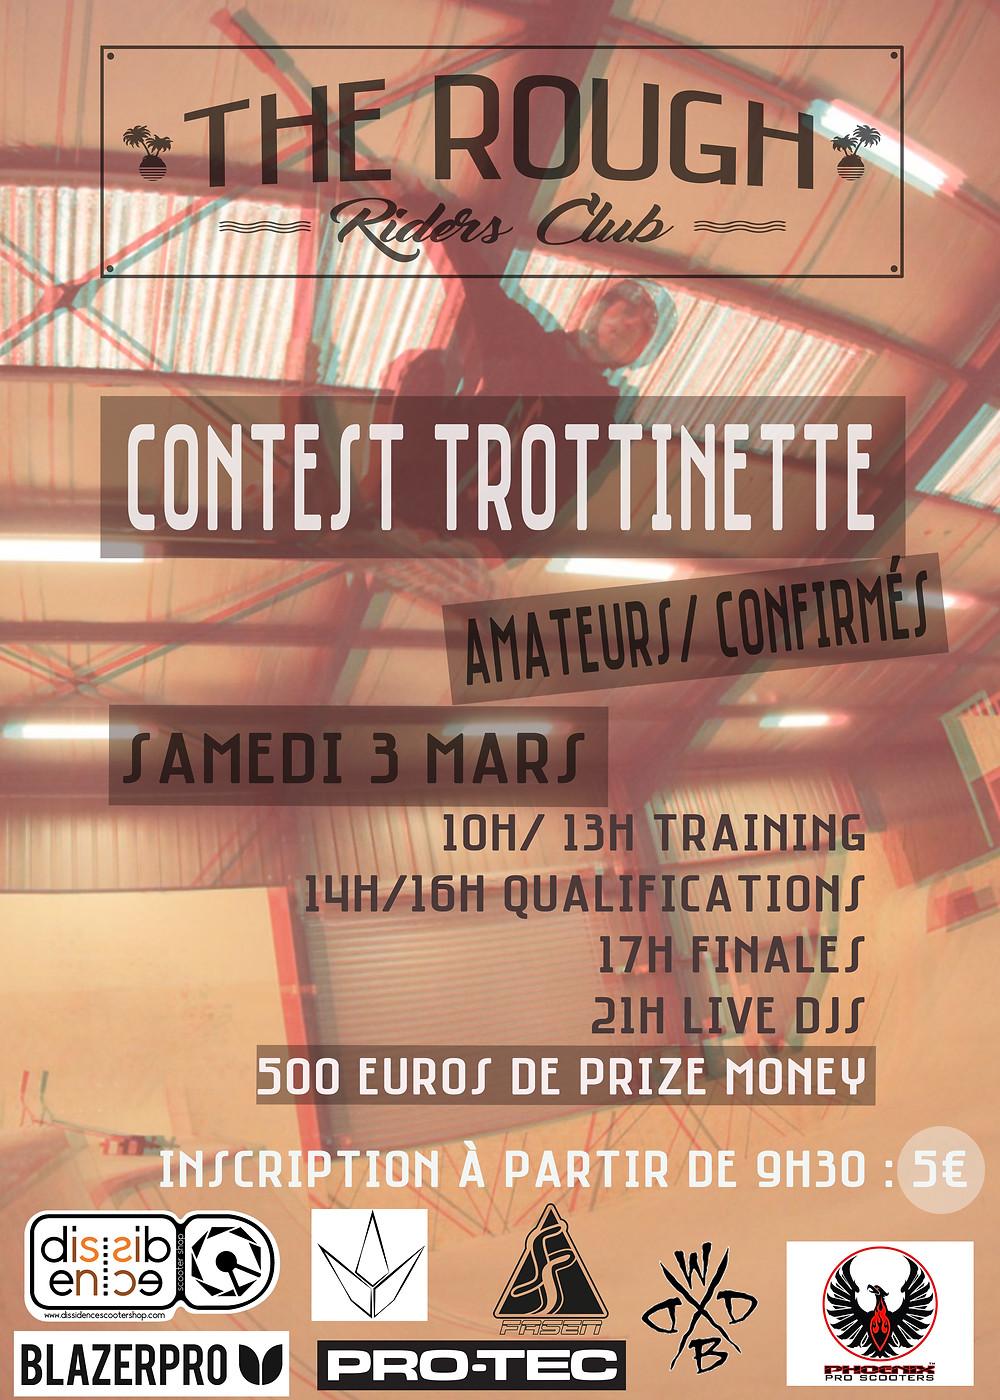 Contest trottinette ROugh Club